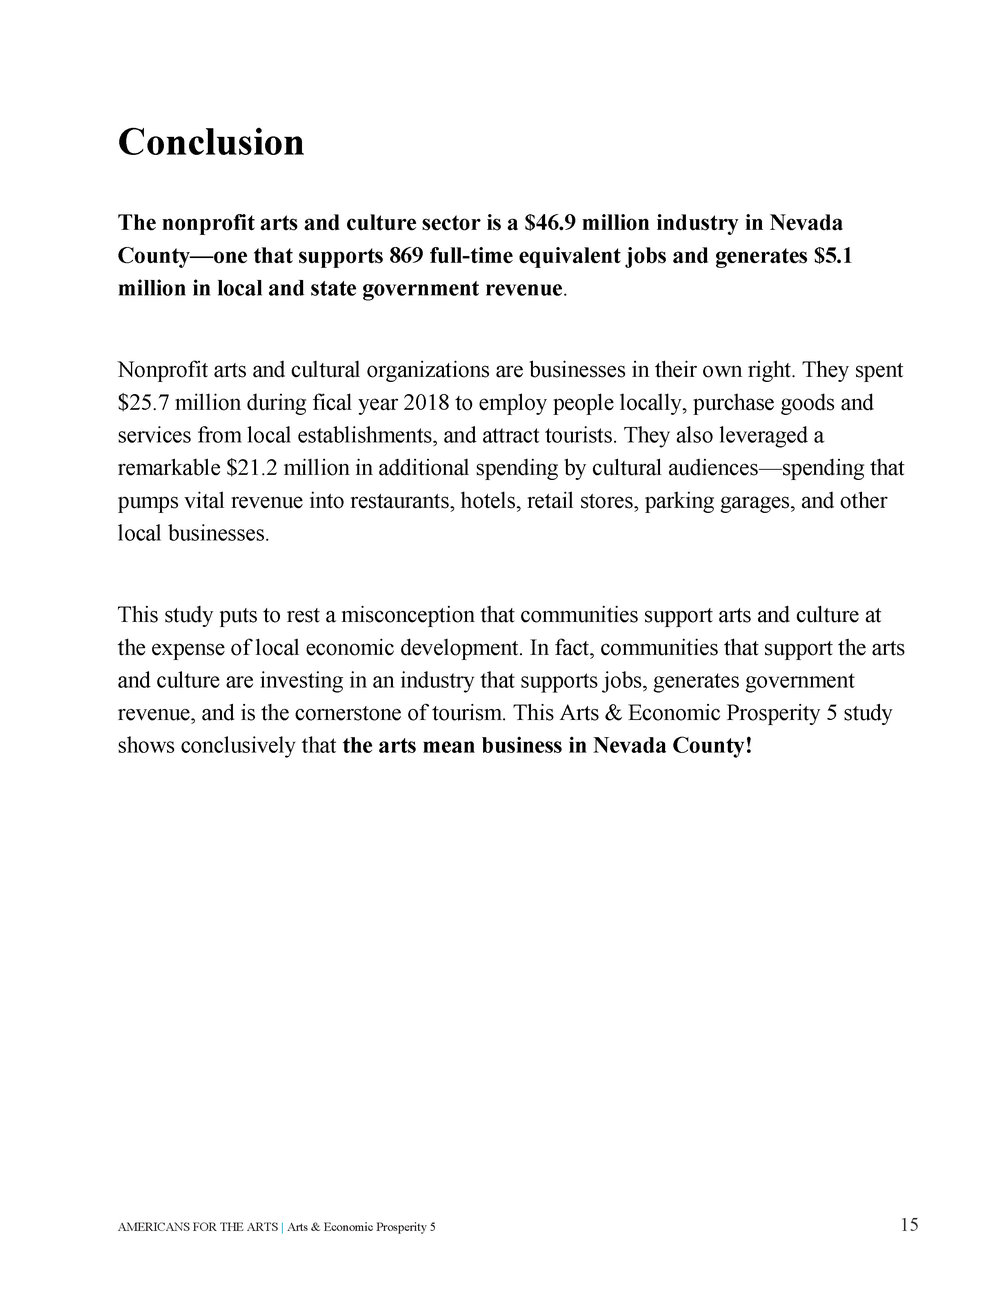 Arts & Economic Prosperity in Nevada County_Page_19.jpg